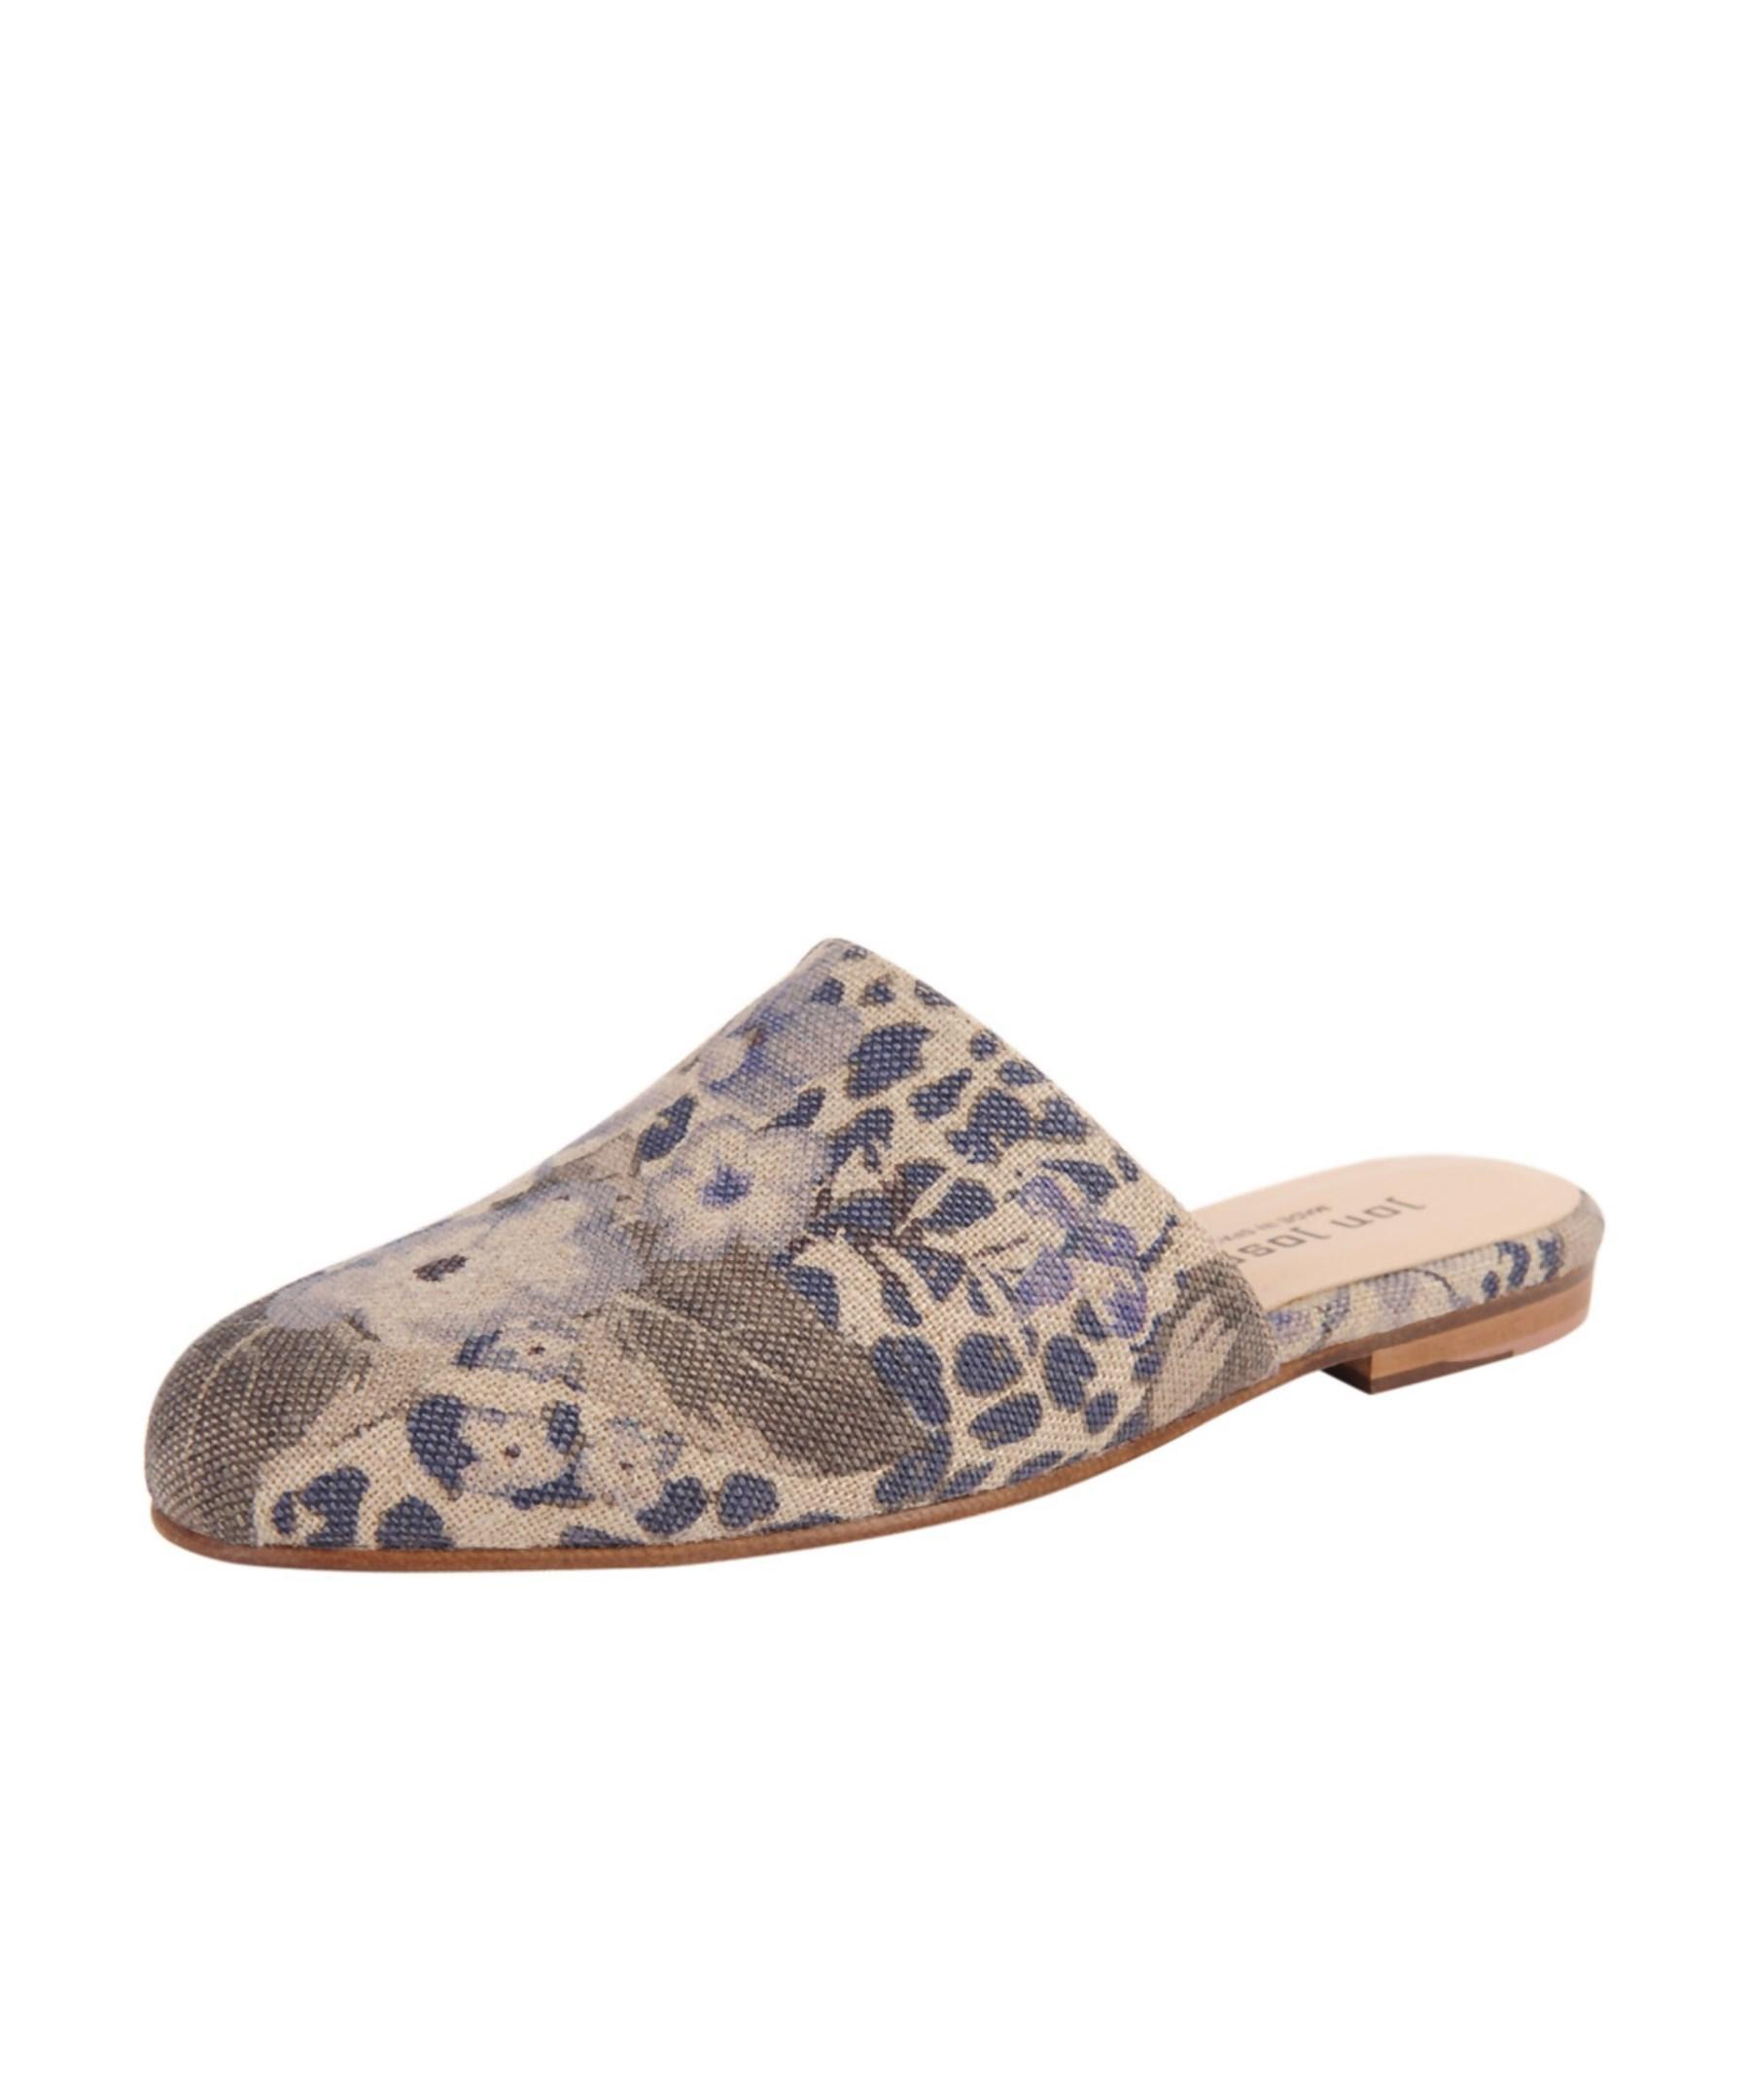 Jon Josef Mens Shoes